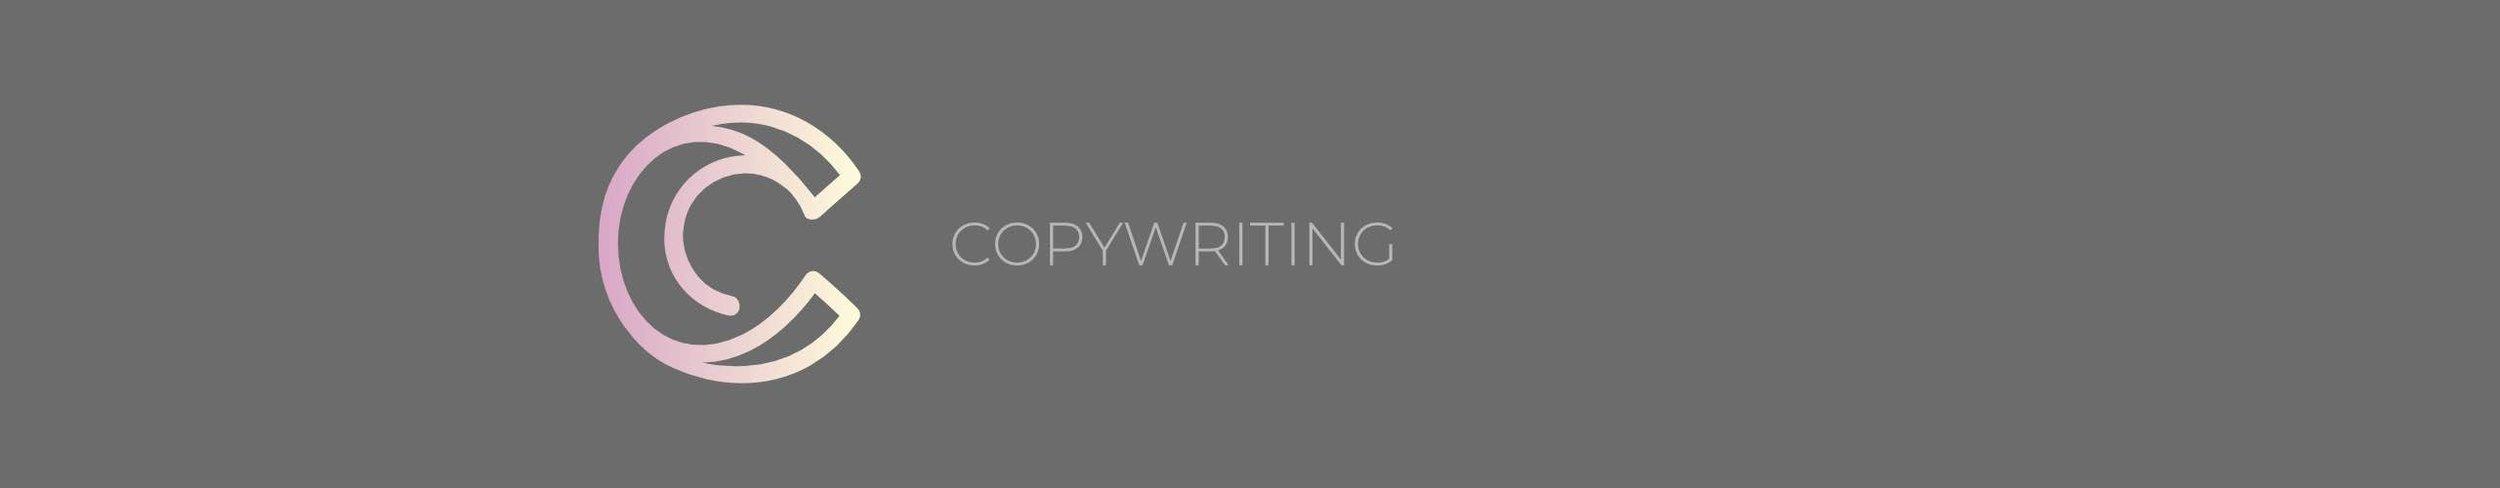 the-creative-co-copywriting-banner.jpg